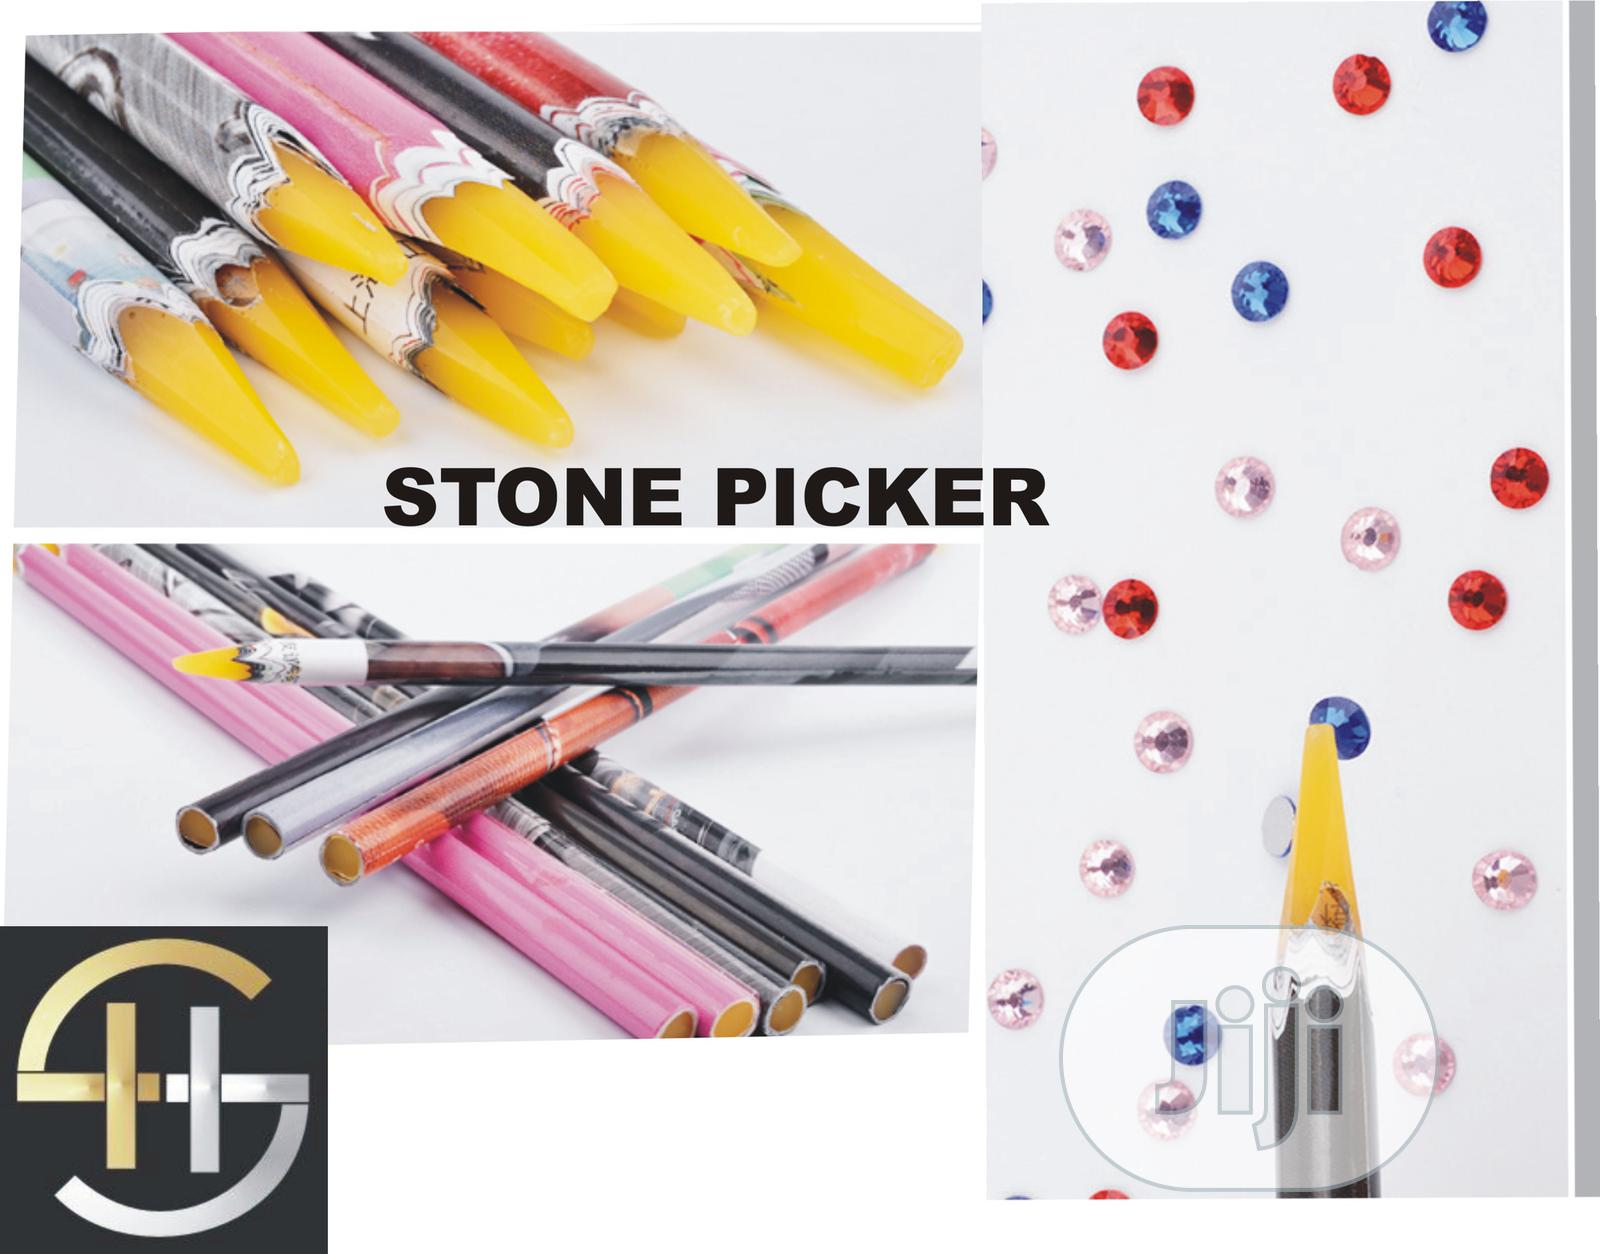 Pen Wax Stone Picker Nails